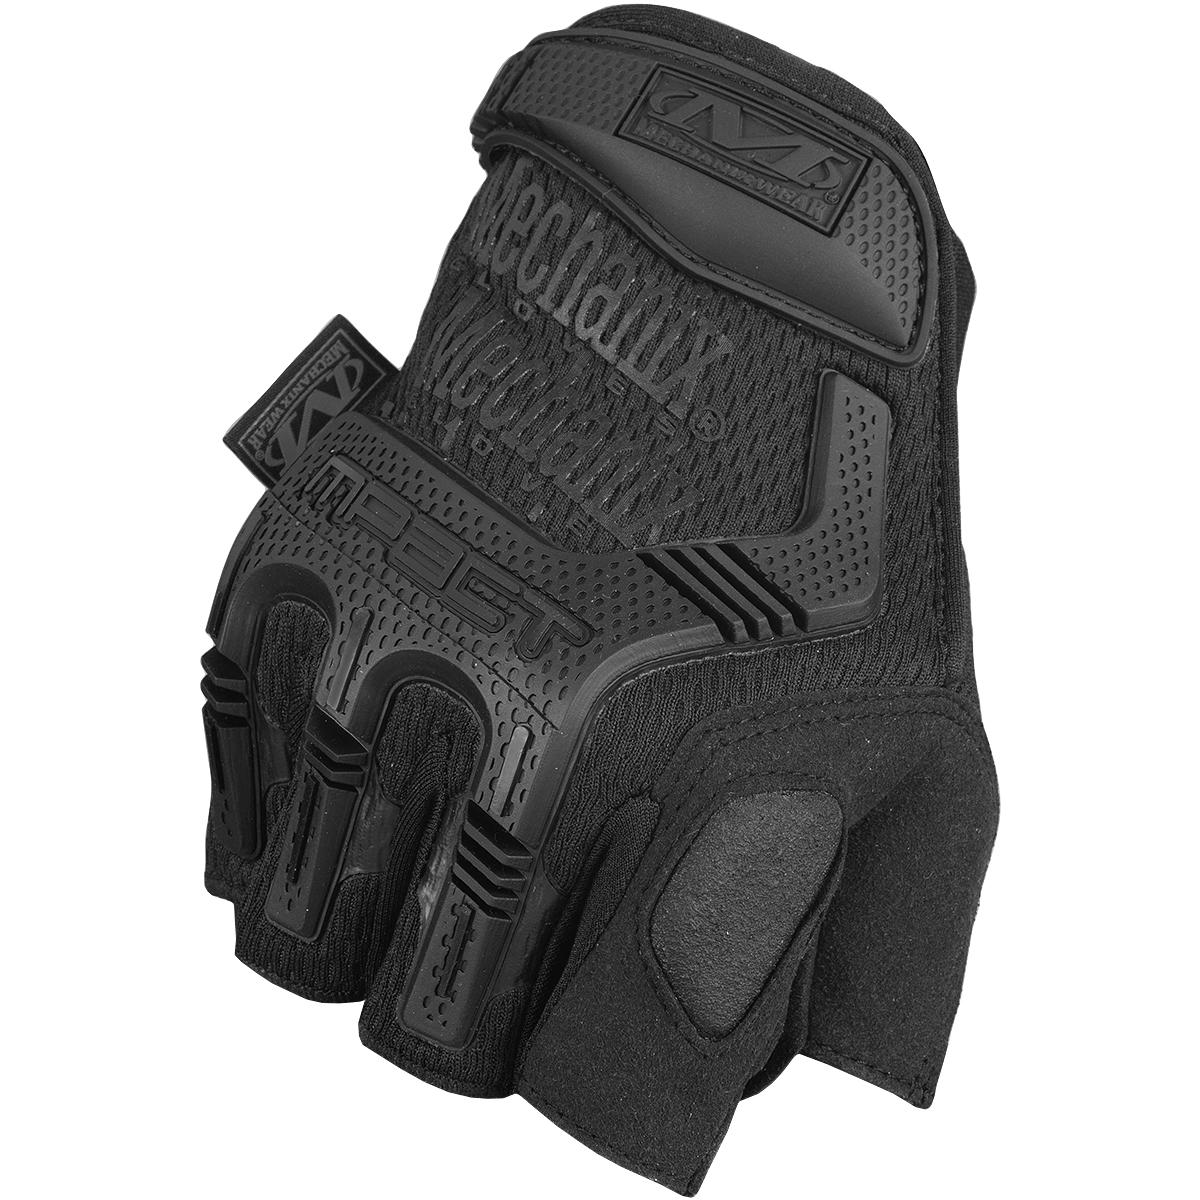 Black leather combat gloves - Mechanix Wear M Pact Fingerless Gloves Covert Mechanix Wear M Pact Fingerless Gloves Covert